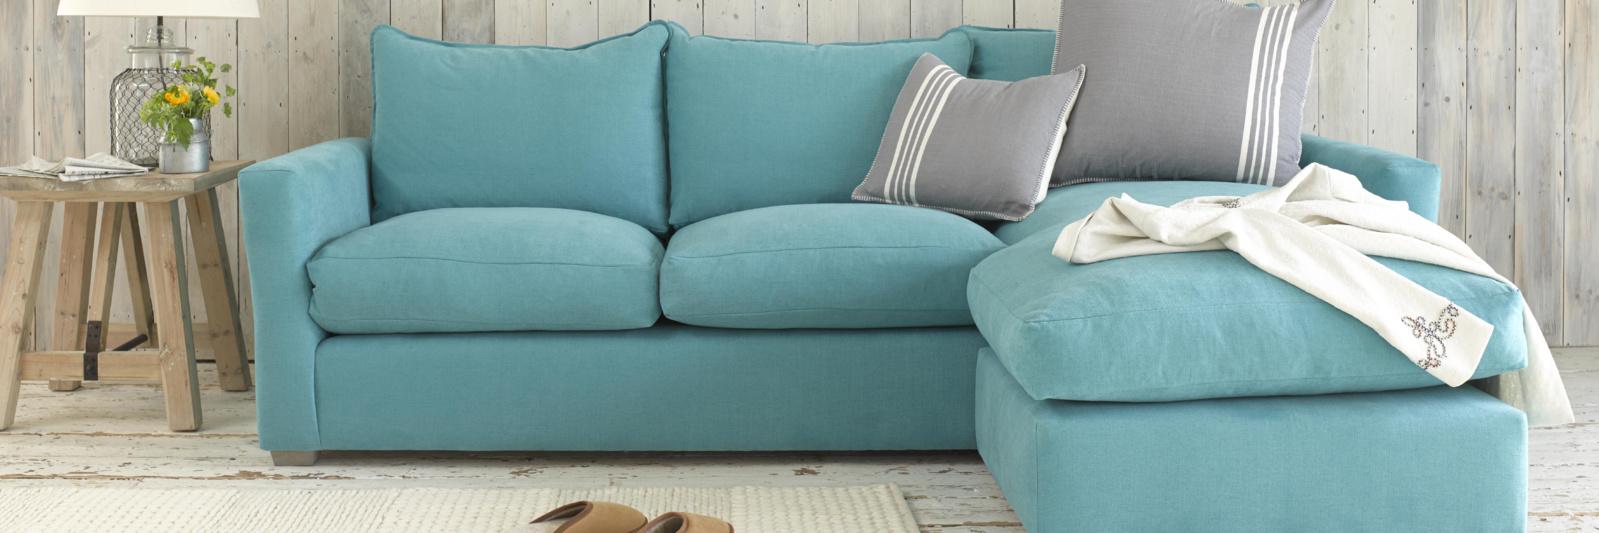 Contemporary British made pavilion corner sofa